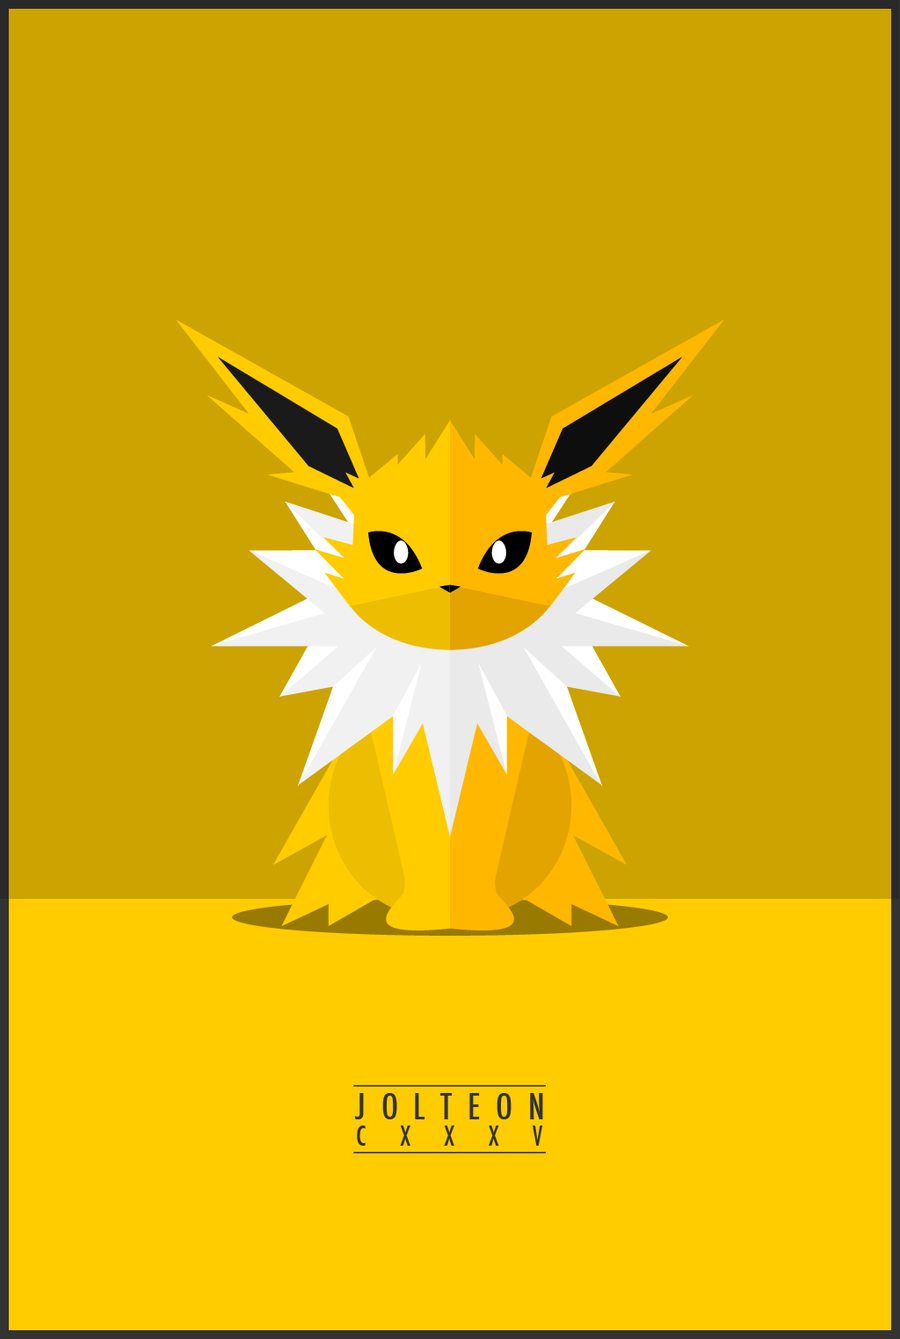 Poster design deviantart - Vector Inspiration Evolution Of Cute Pokemon Minimal Poster Designs